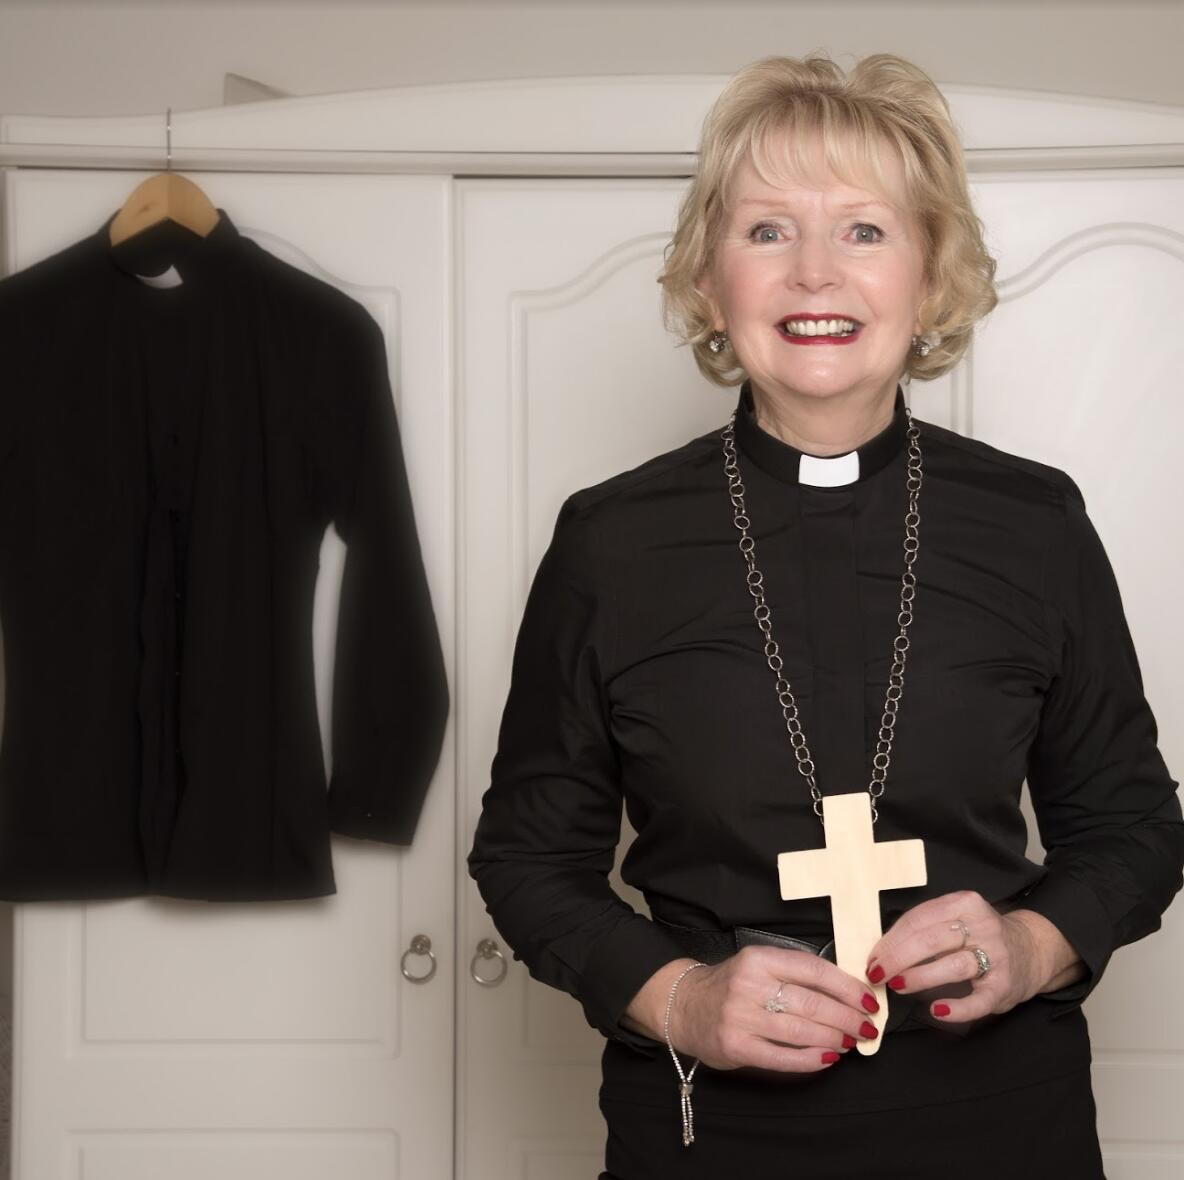 Women's Clergy Attire